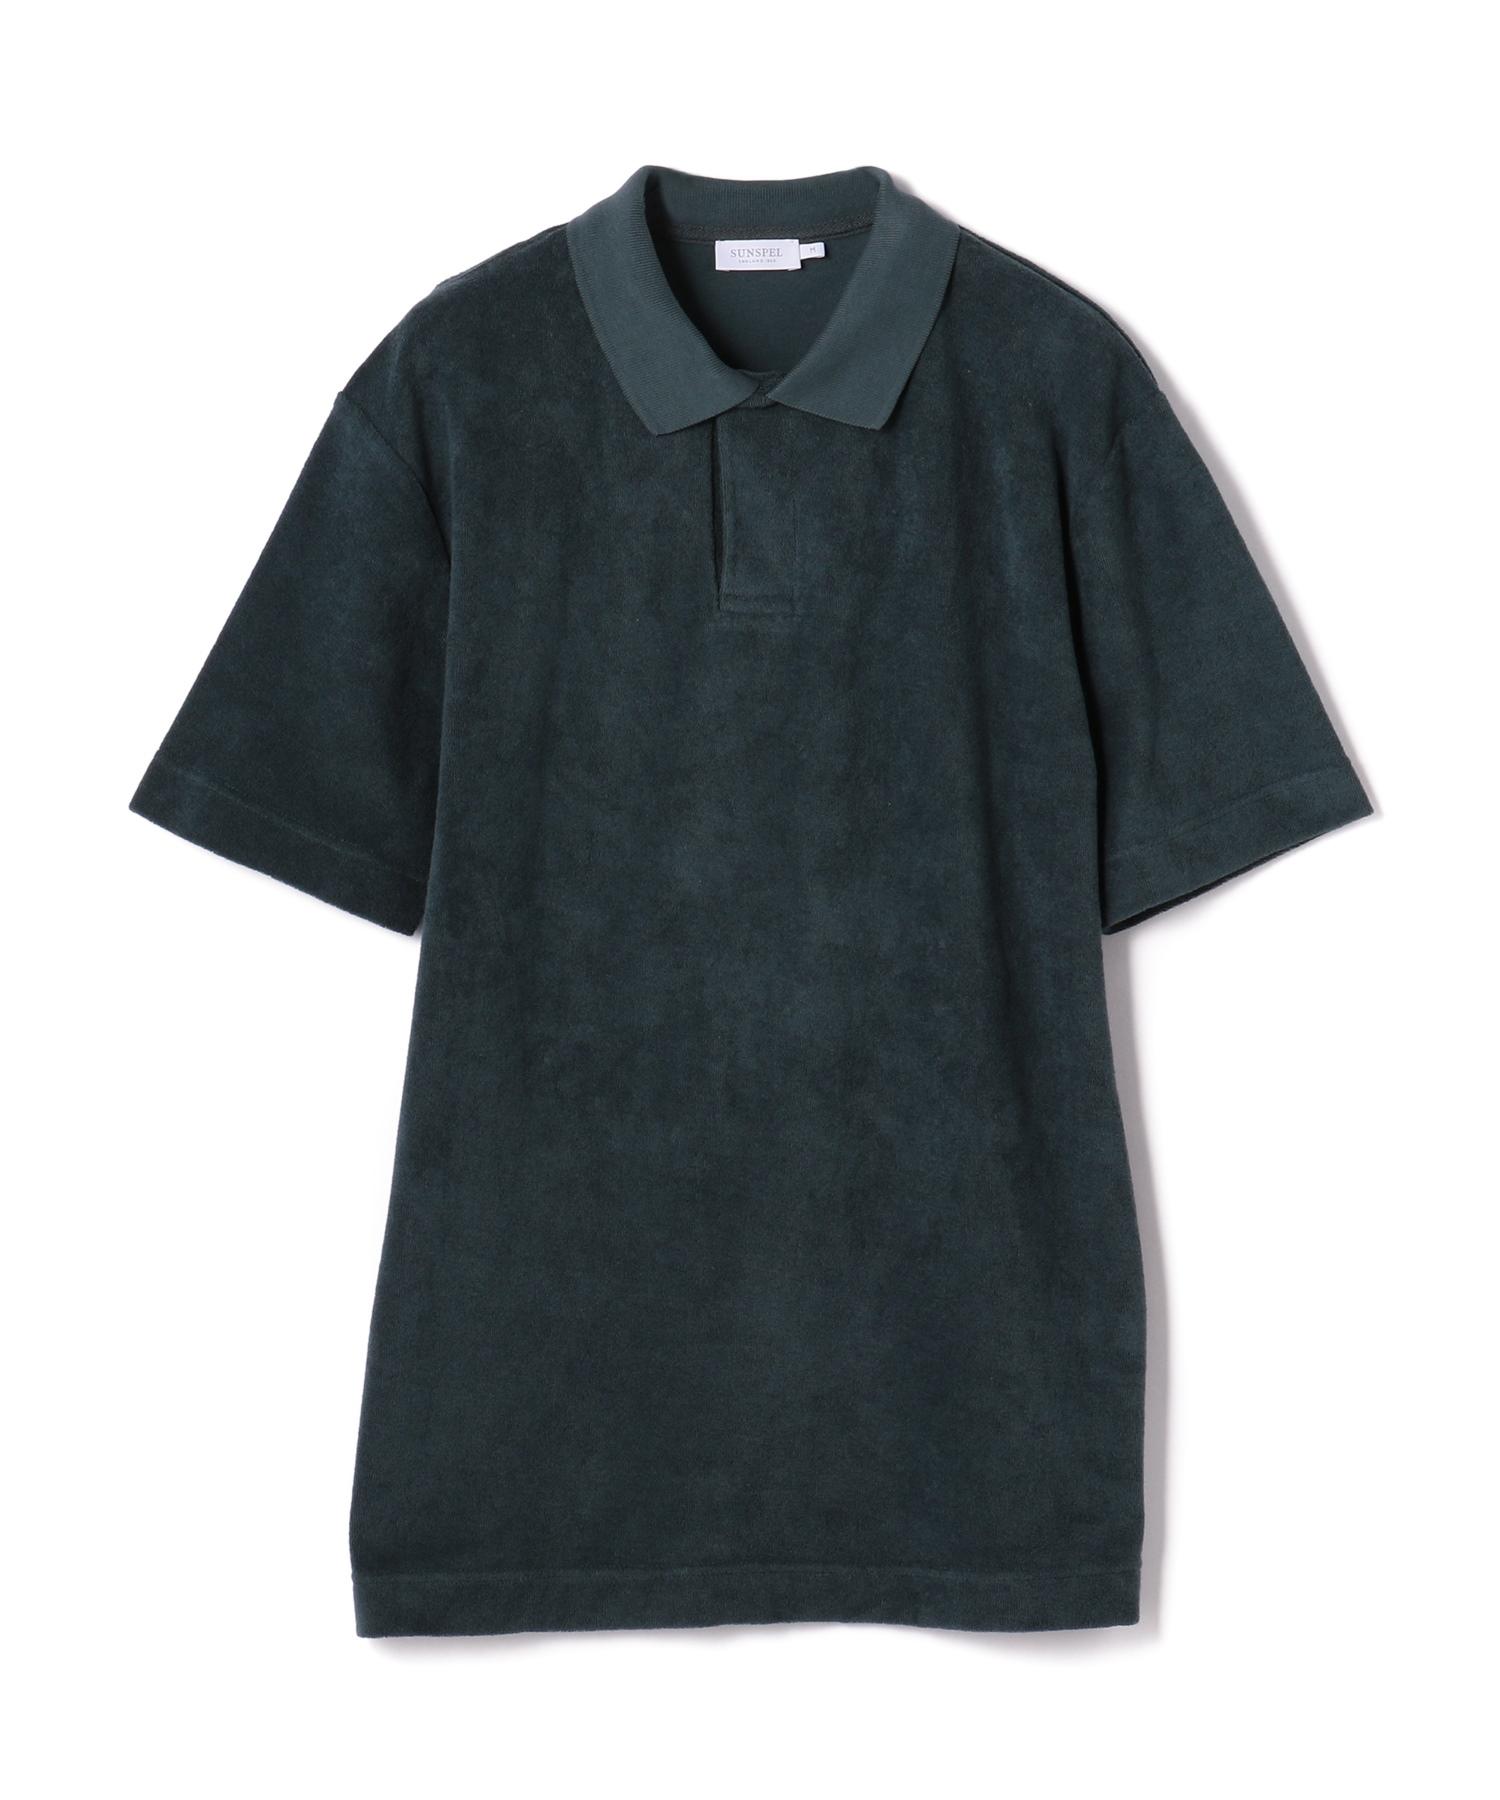 SUNSPEL / ポロシャツ